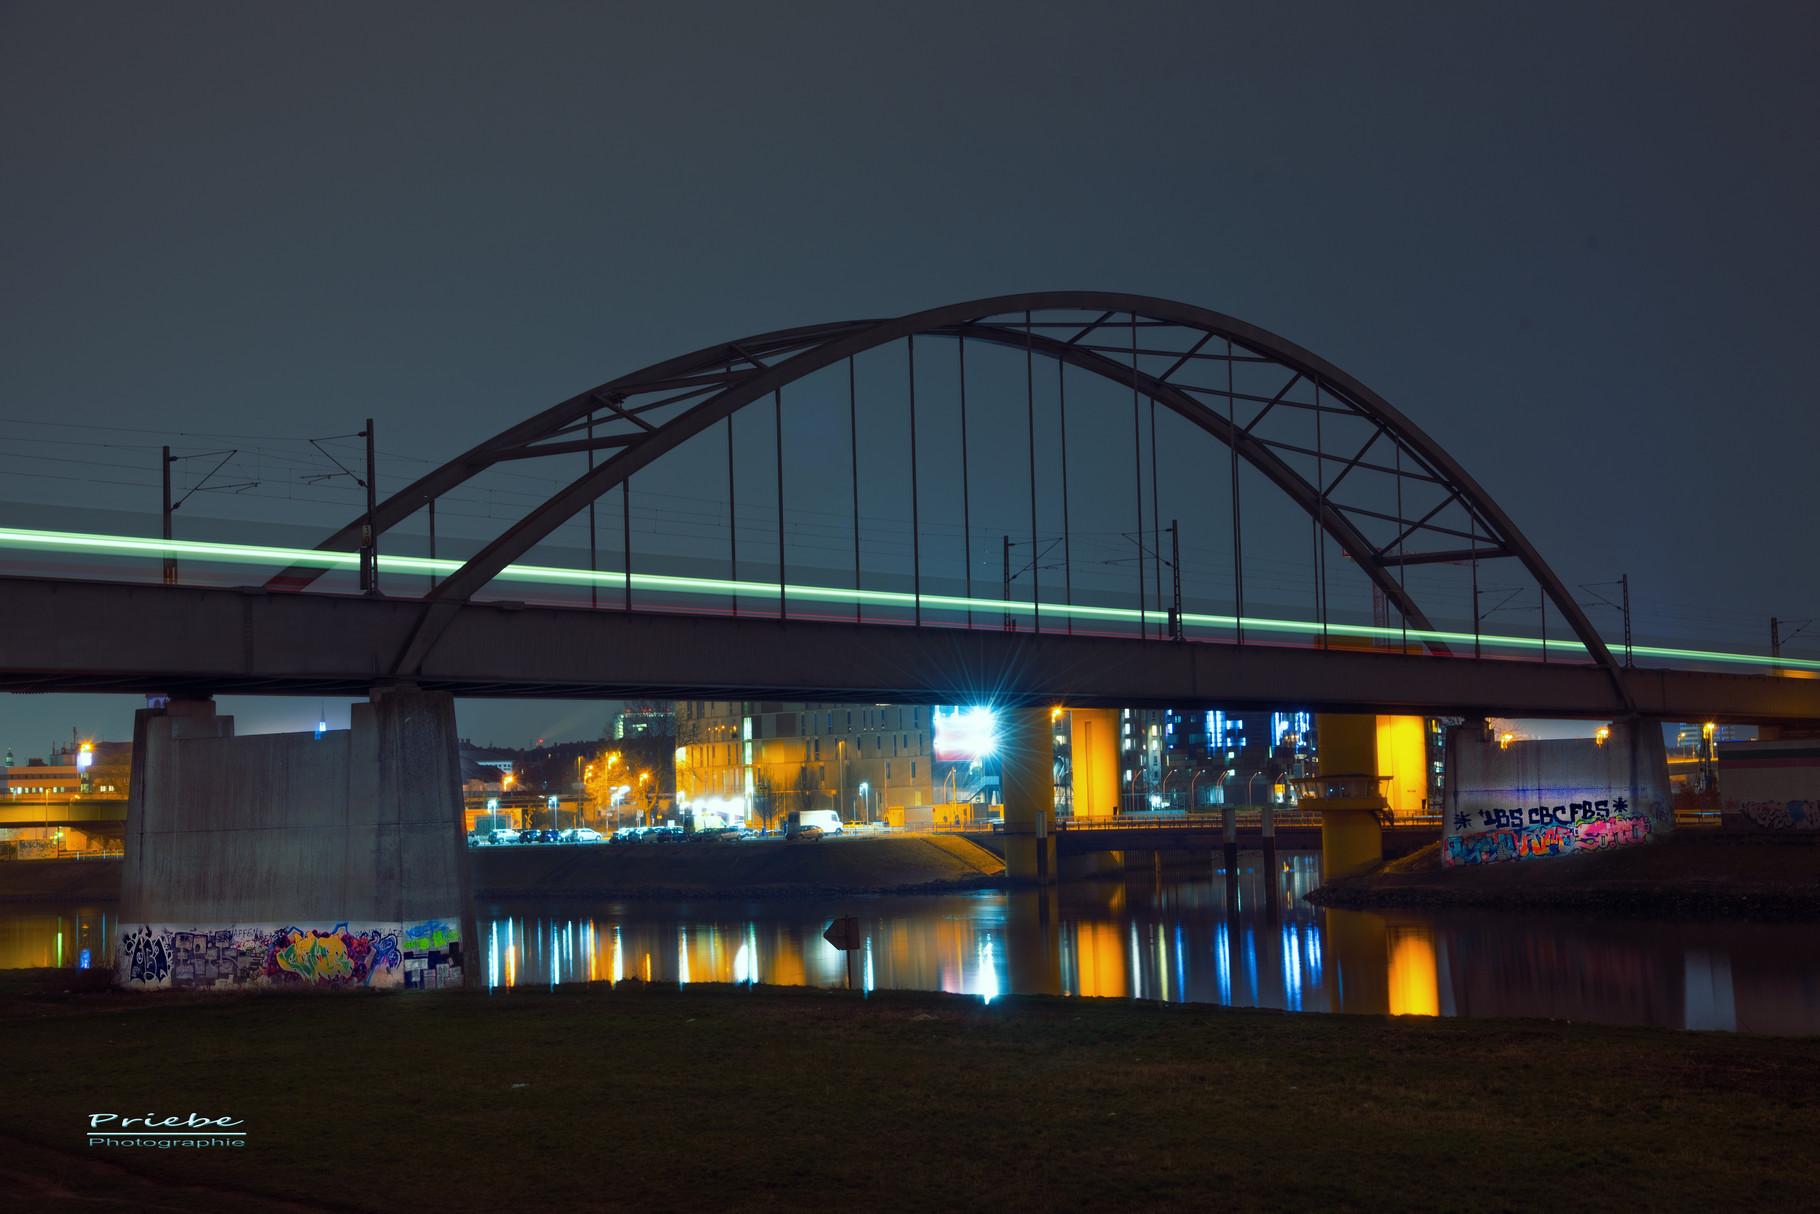 Bogenbrücke in Mannheim-Neckarstadt